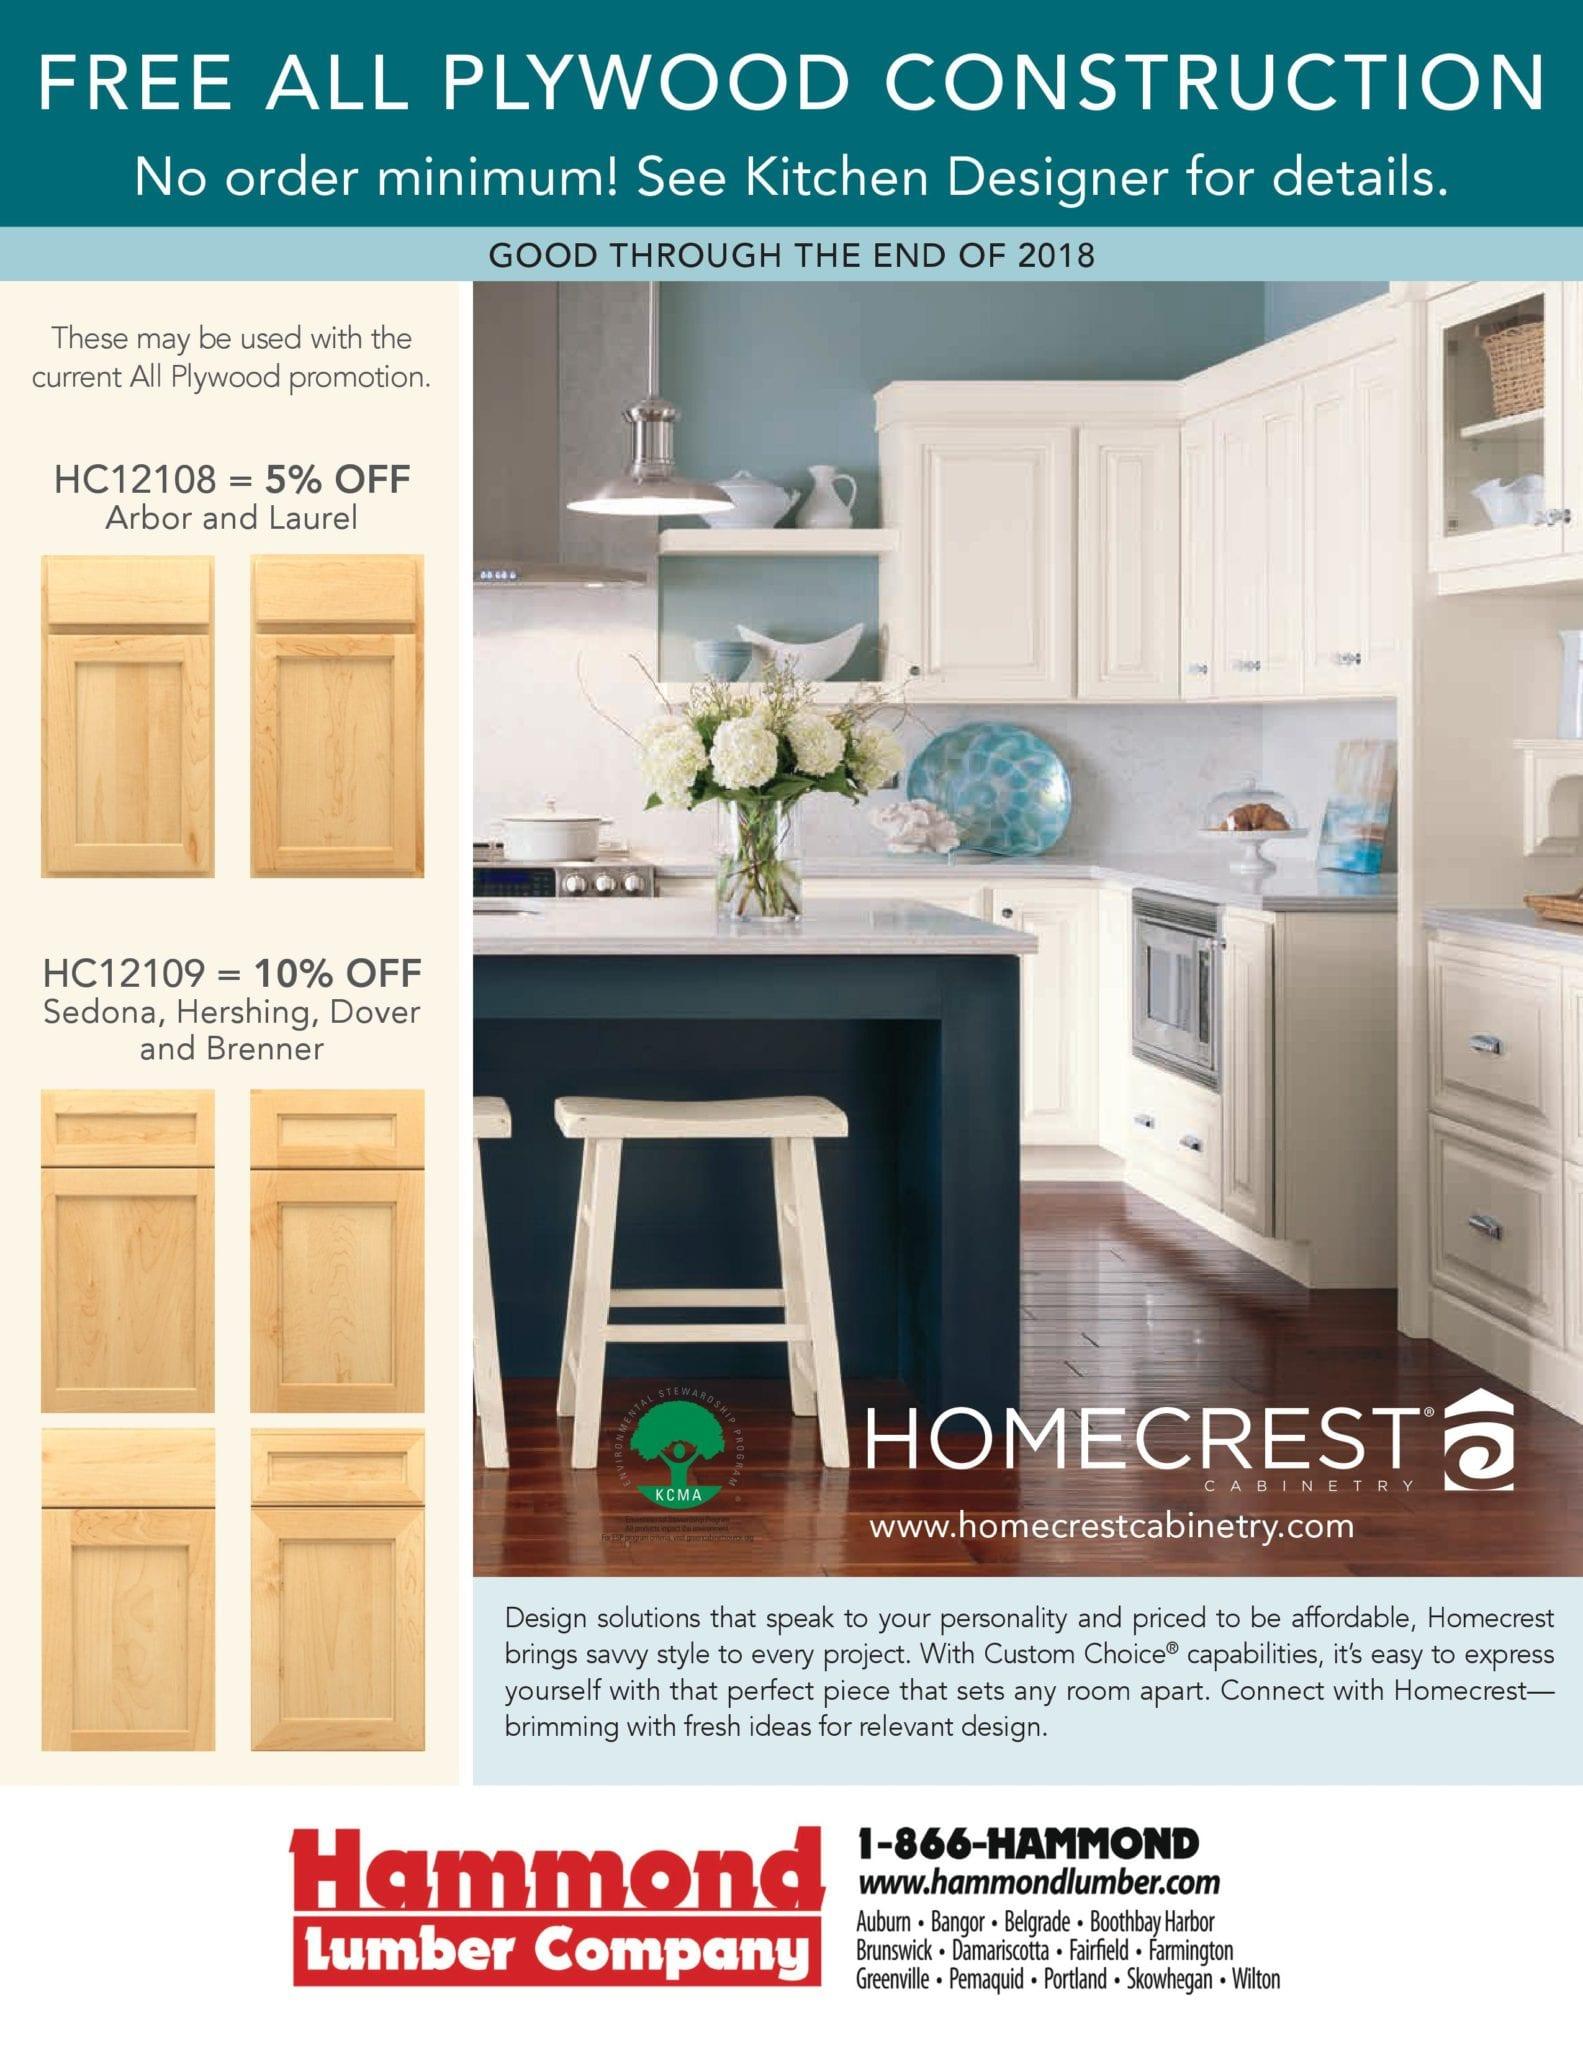 Homecrest Cabinetry Special Hammond Lumber